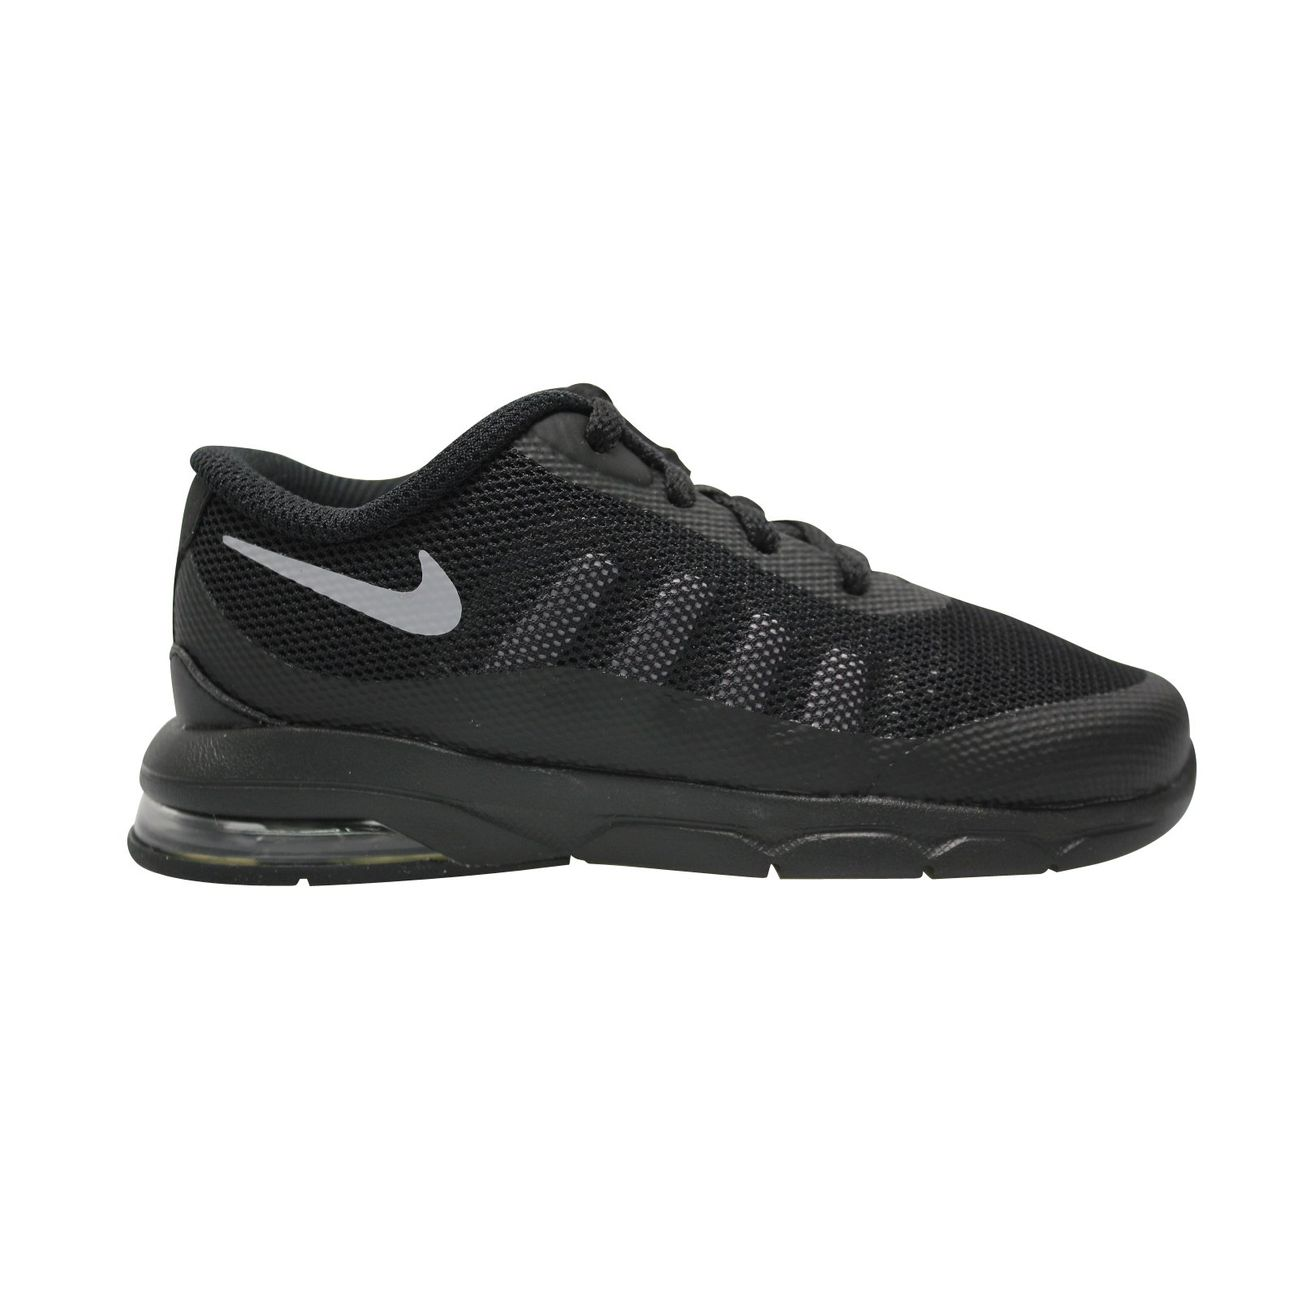 Chaussures Enfant Nike Air Max Invigor TD Noir Online